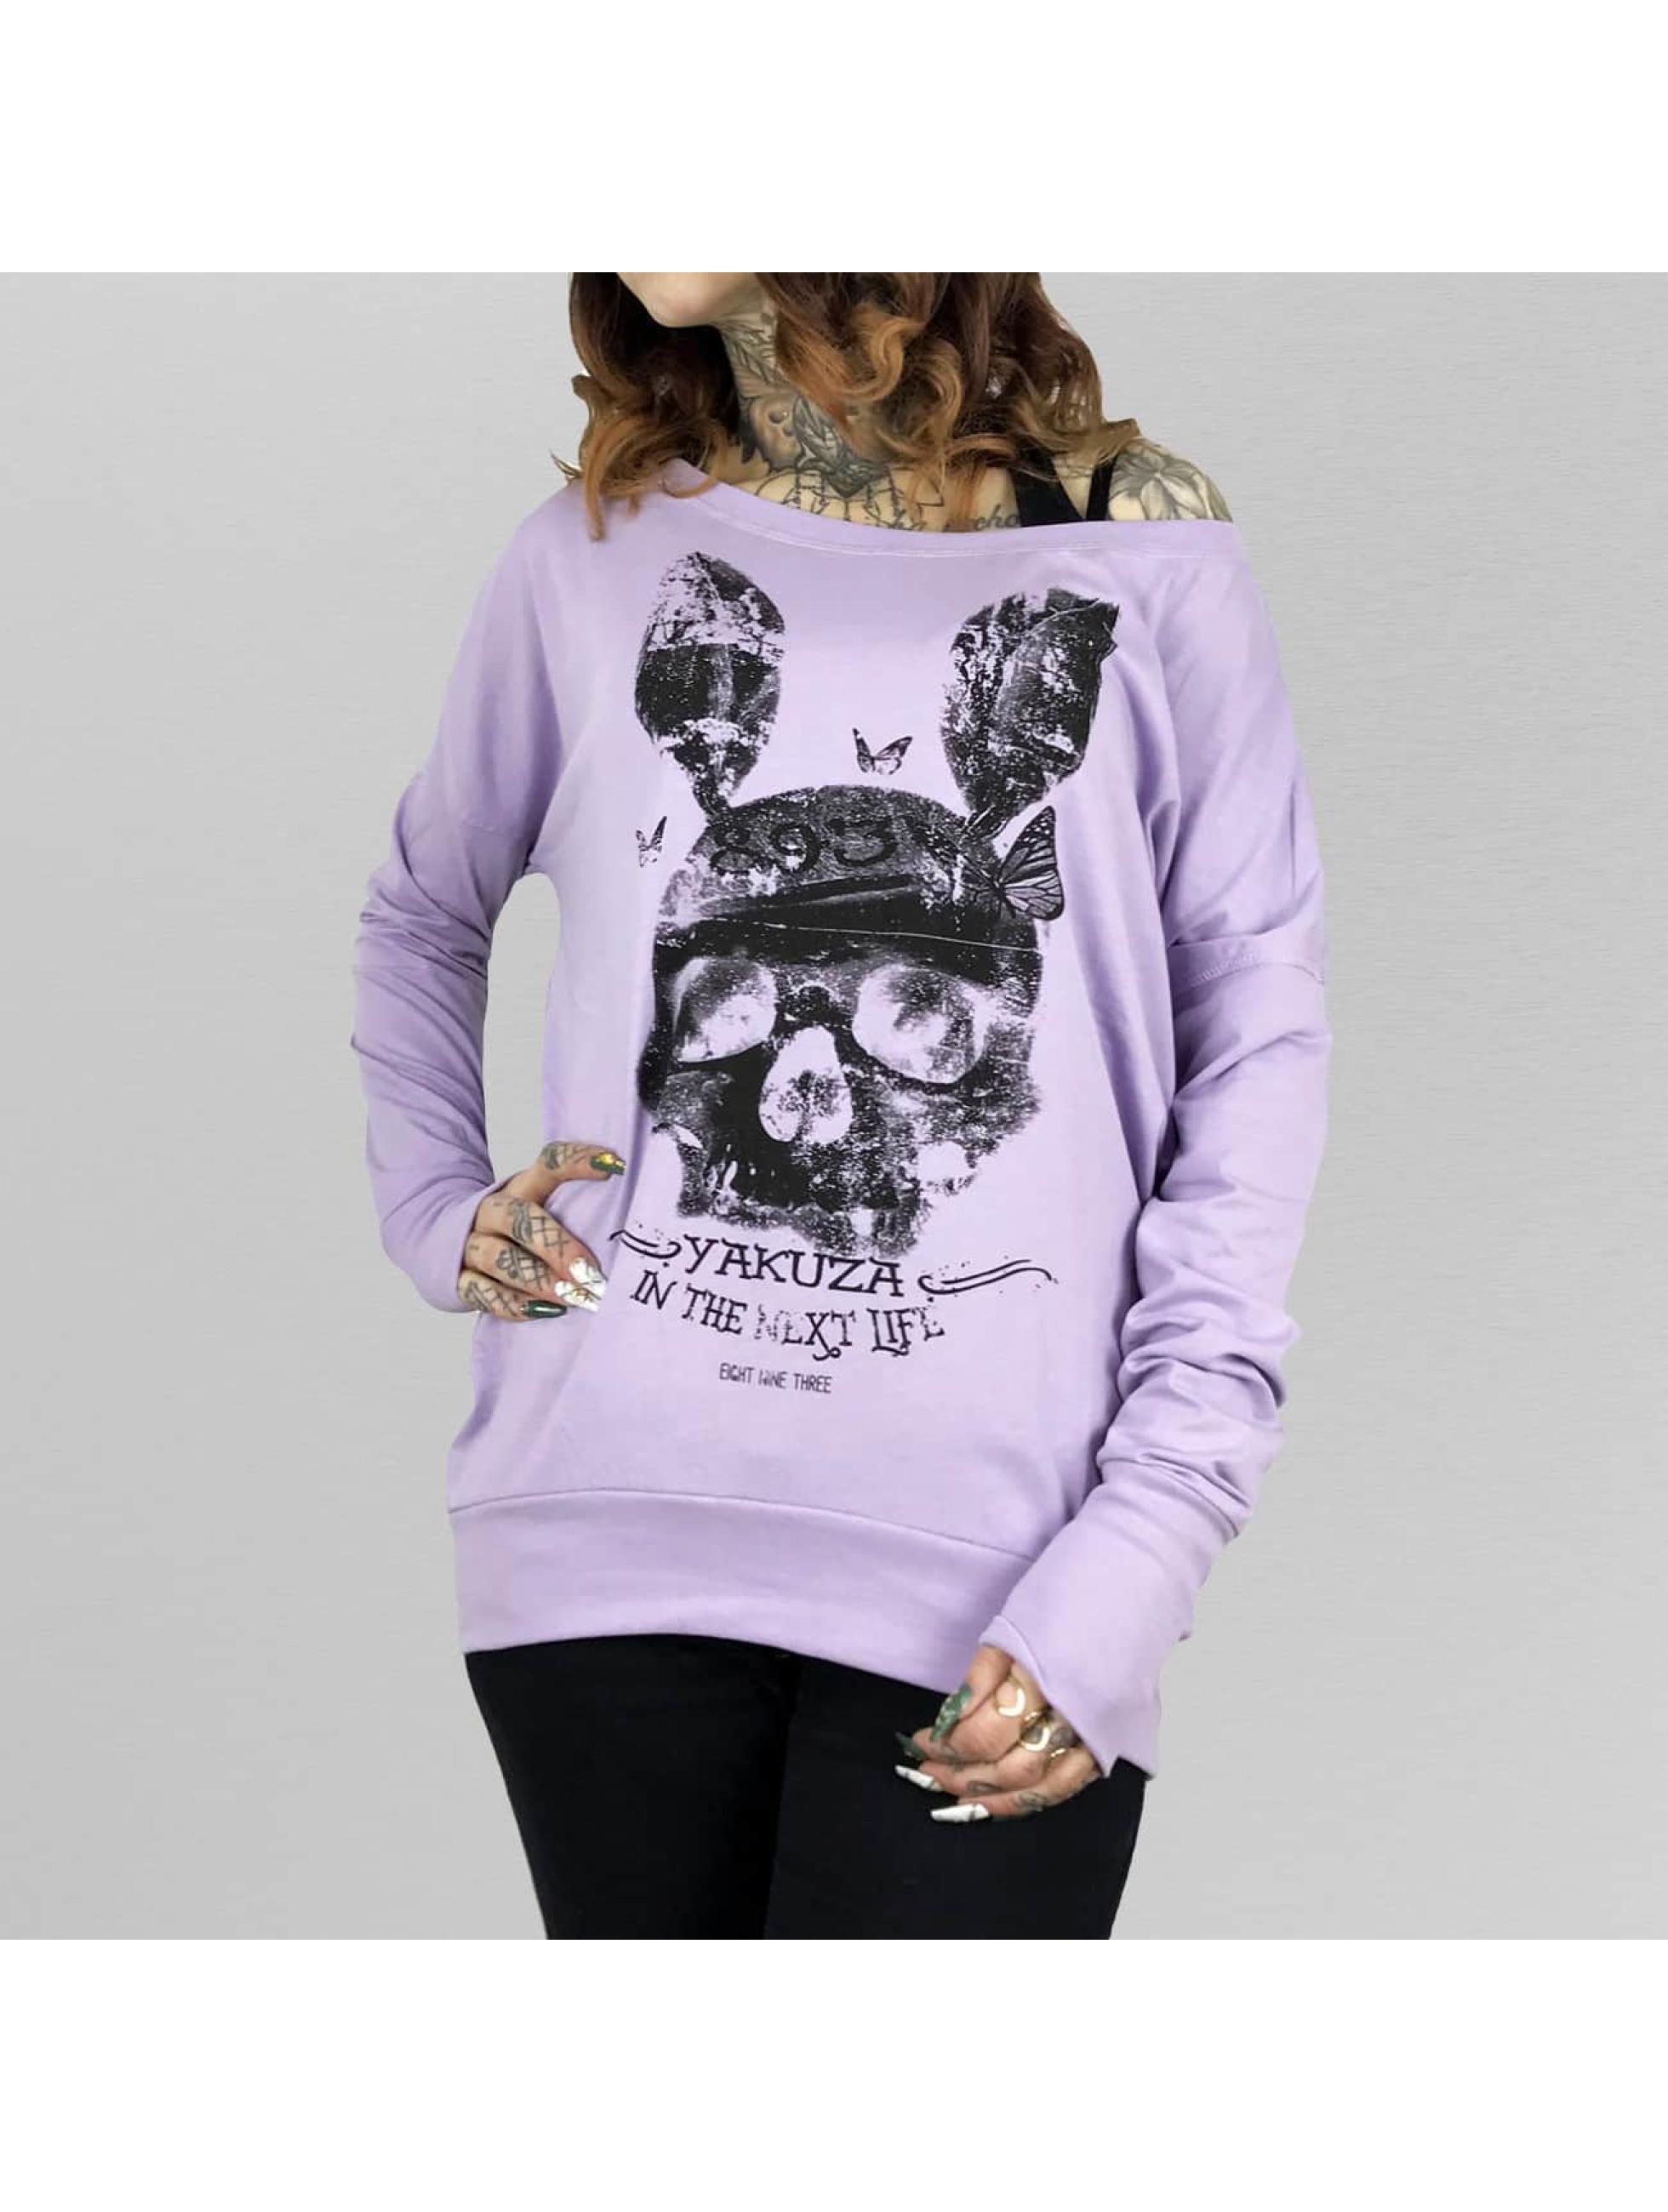 Yakuza Dead Bunny Wide Crew Longsleeve Lavender Frost Sale Angebote